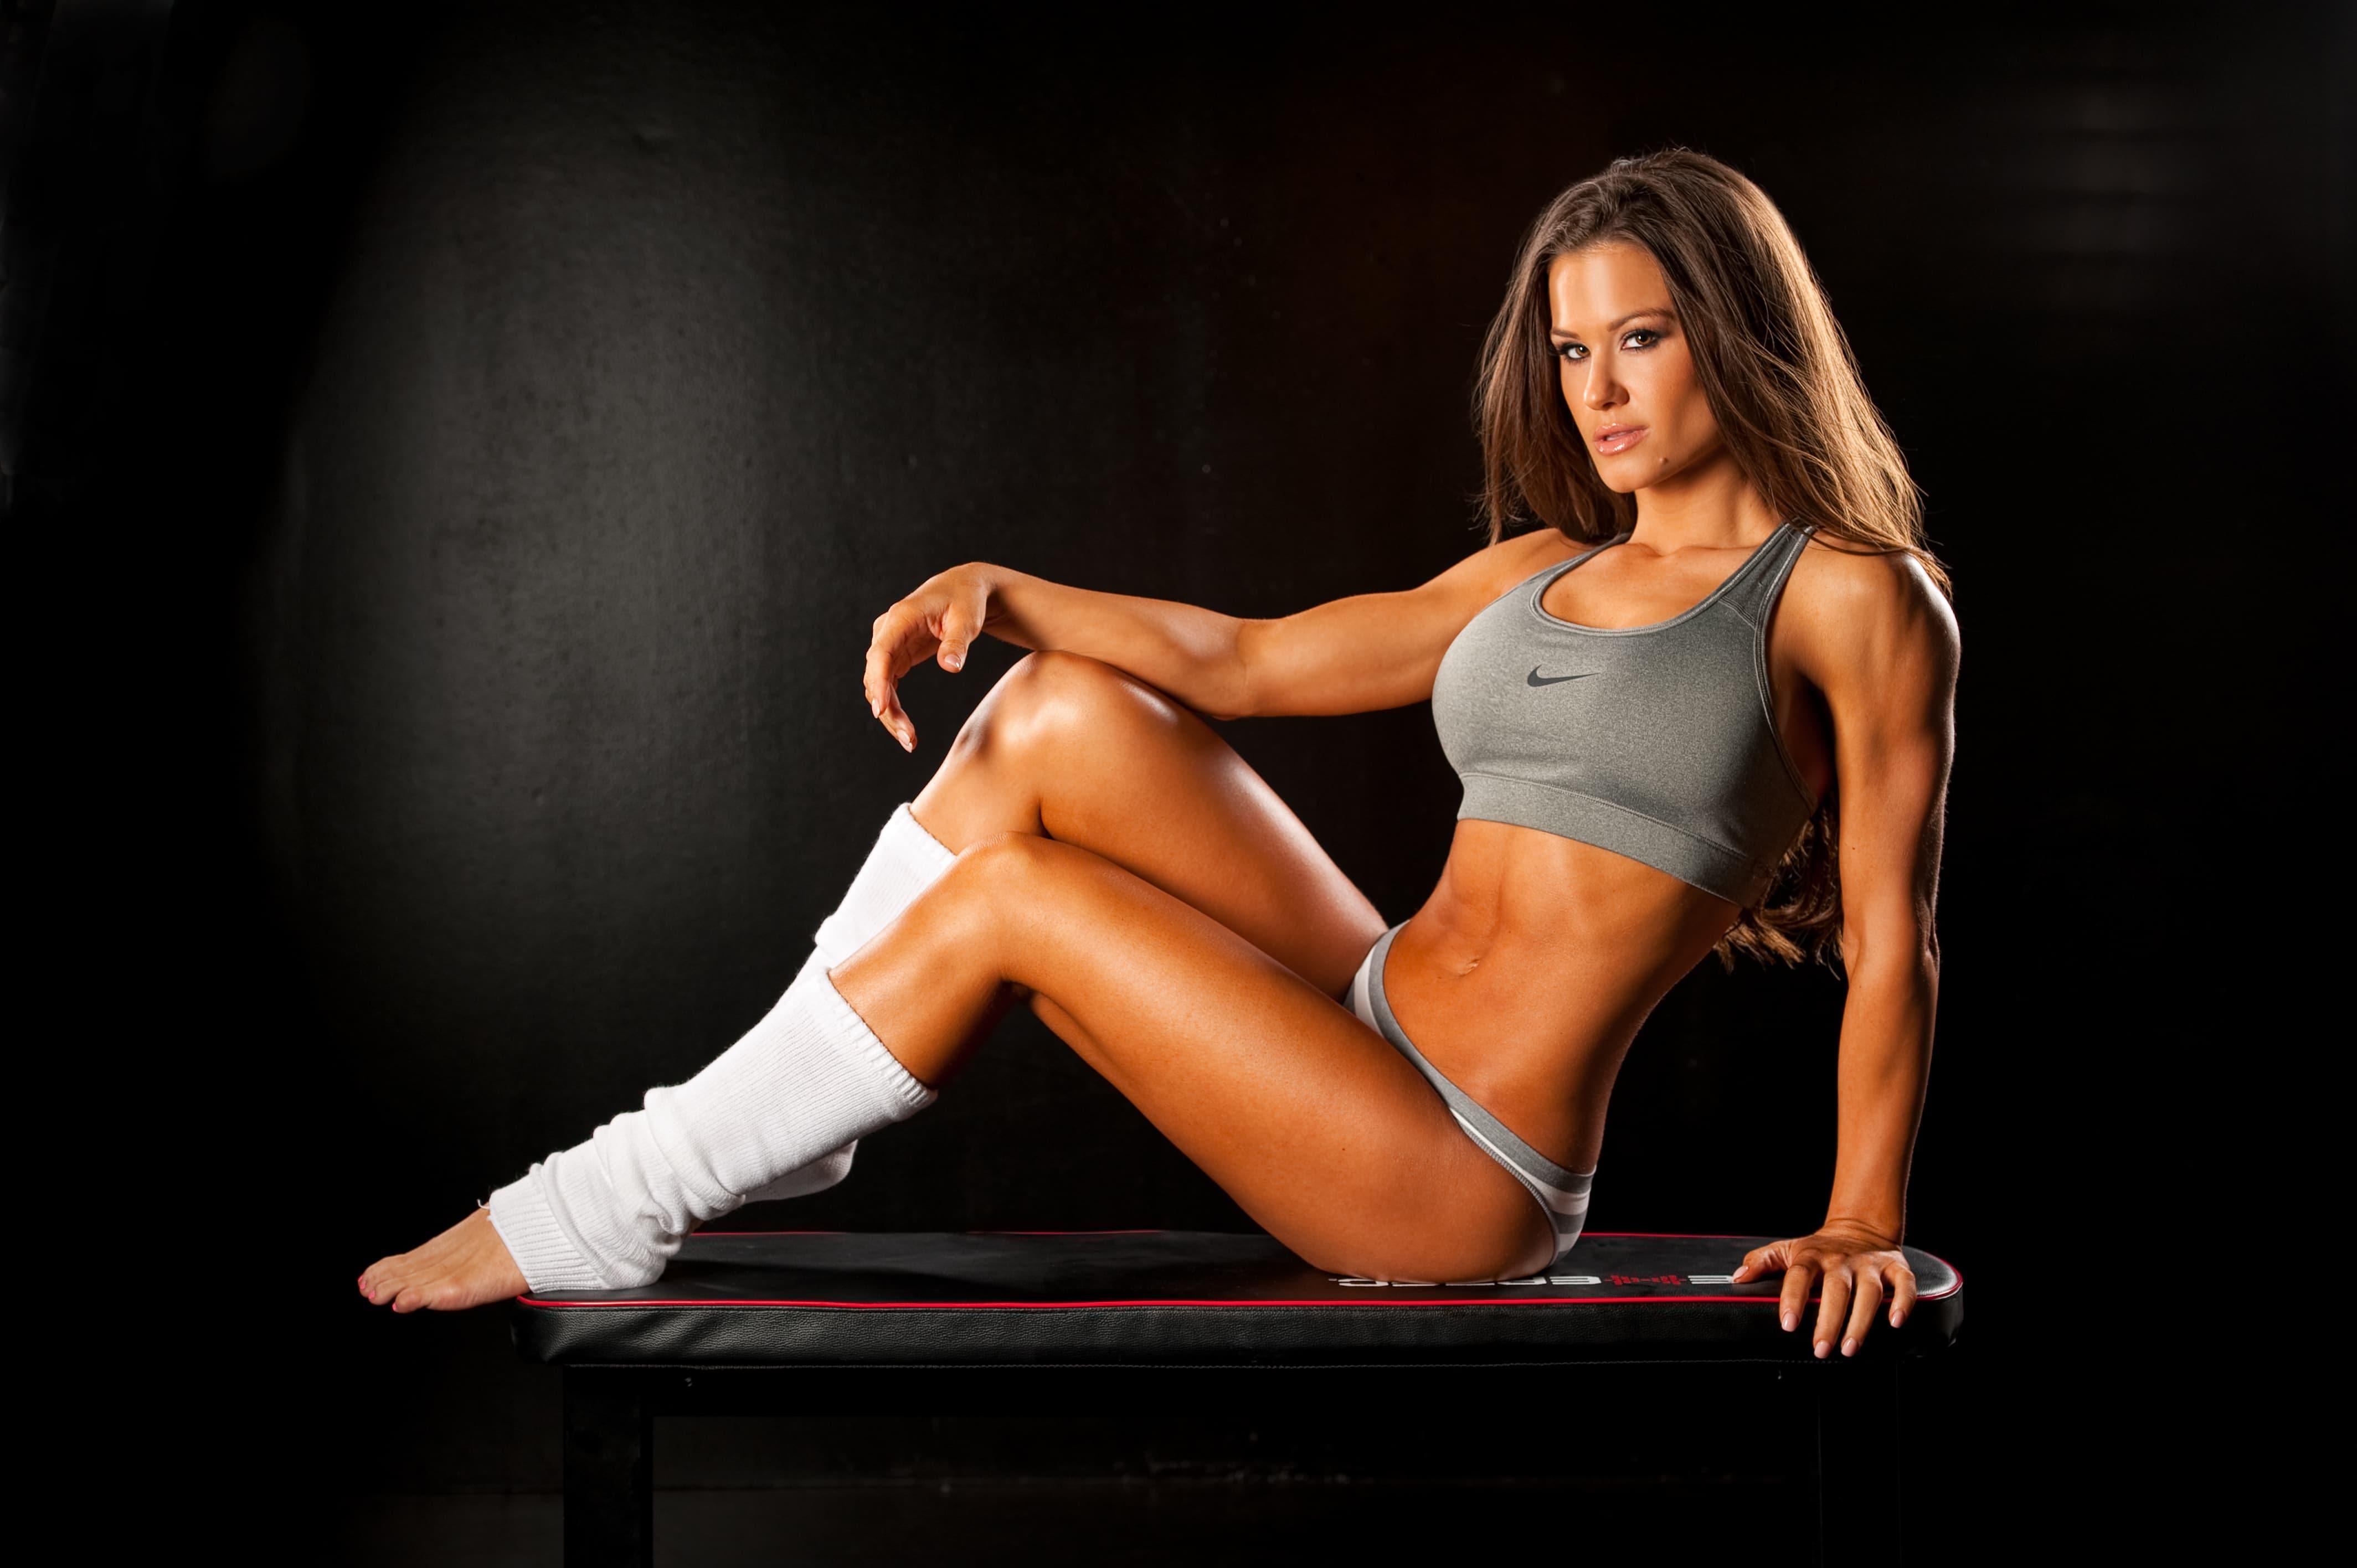 Brooke-TNA